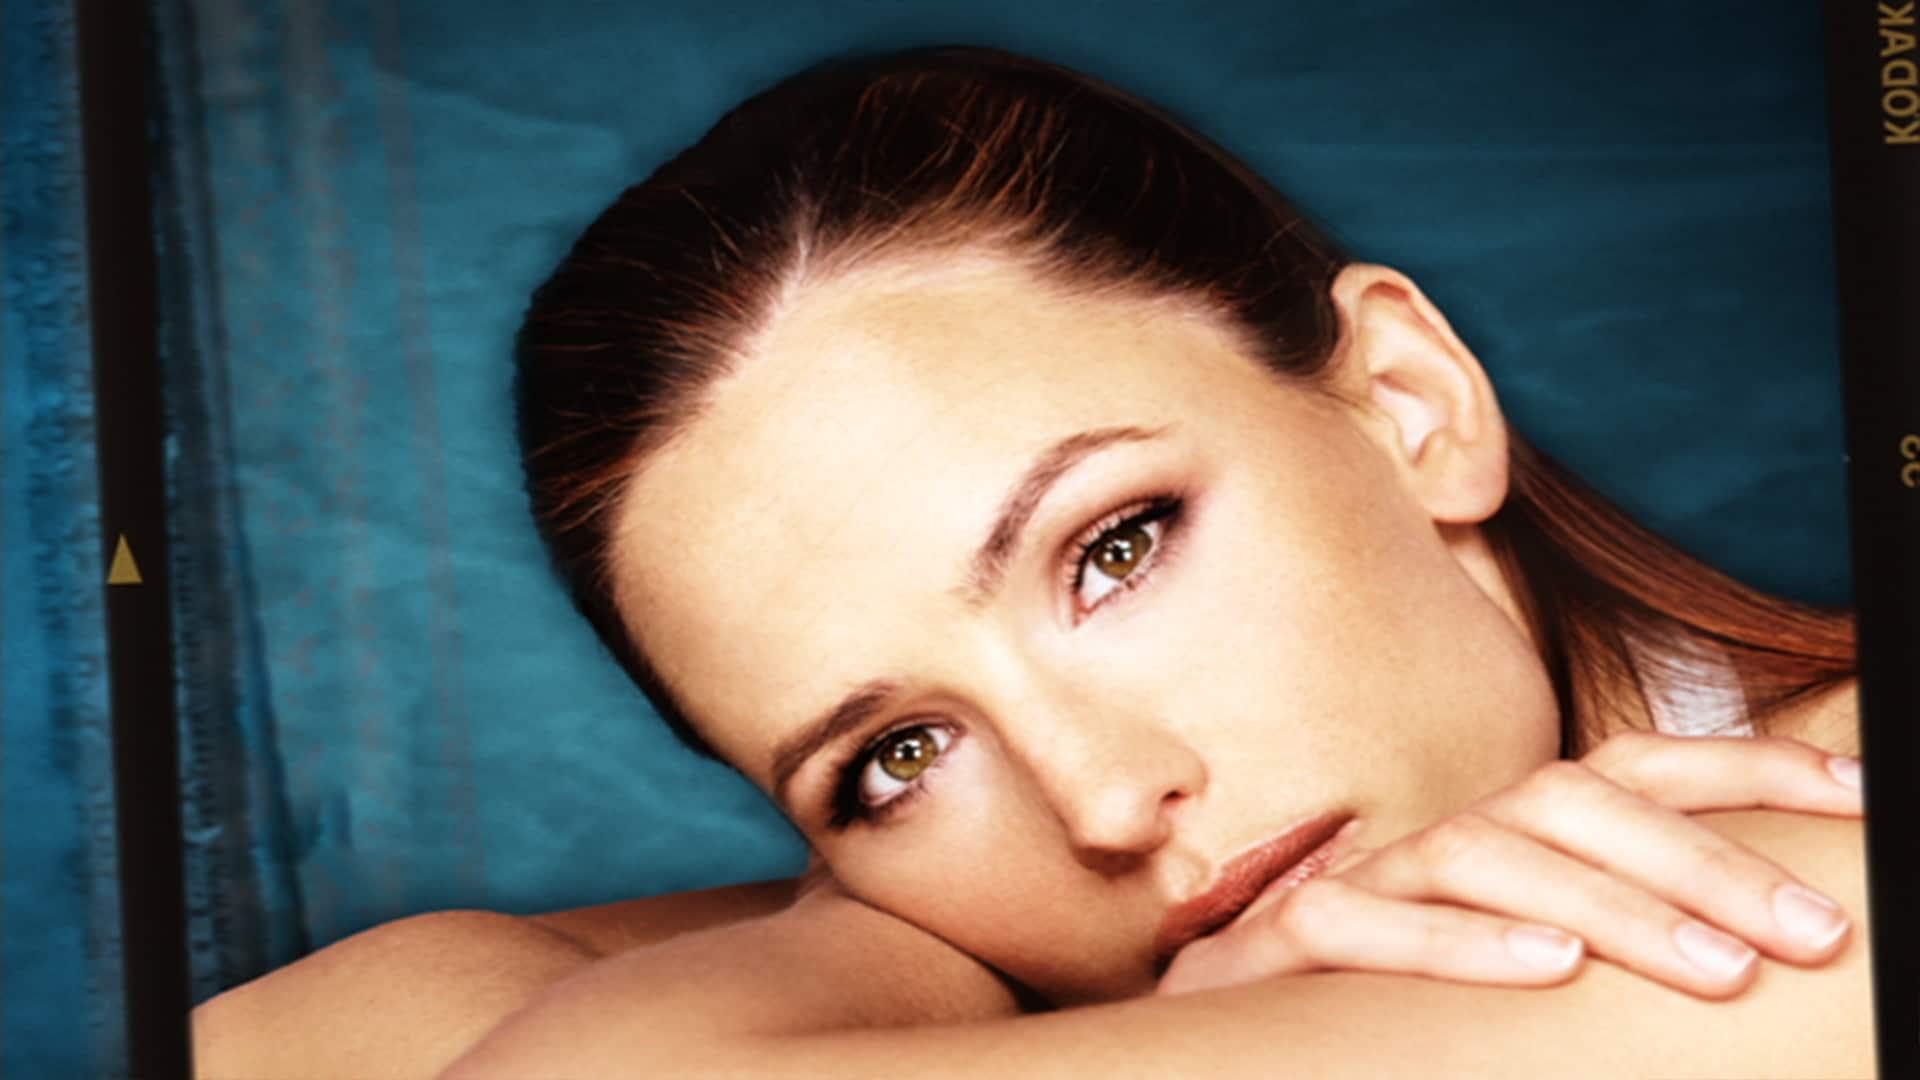 Jennifer Garner: February 15, 2003